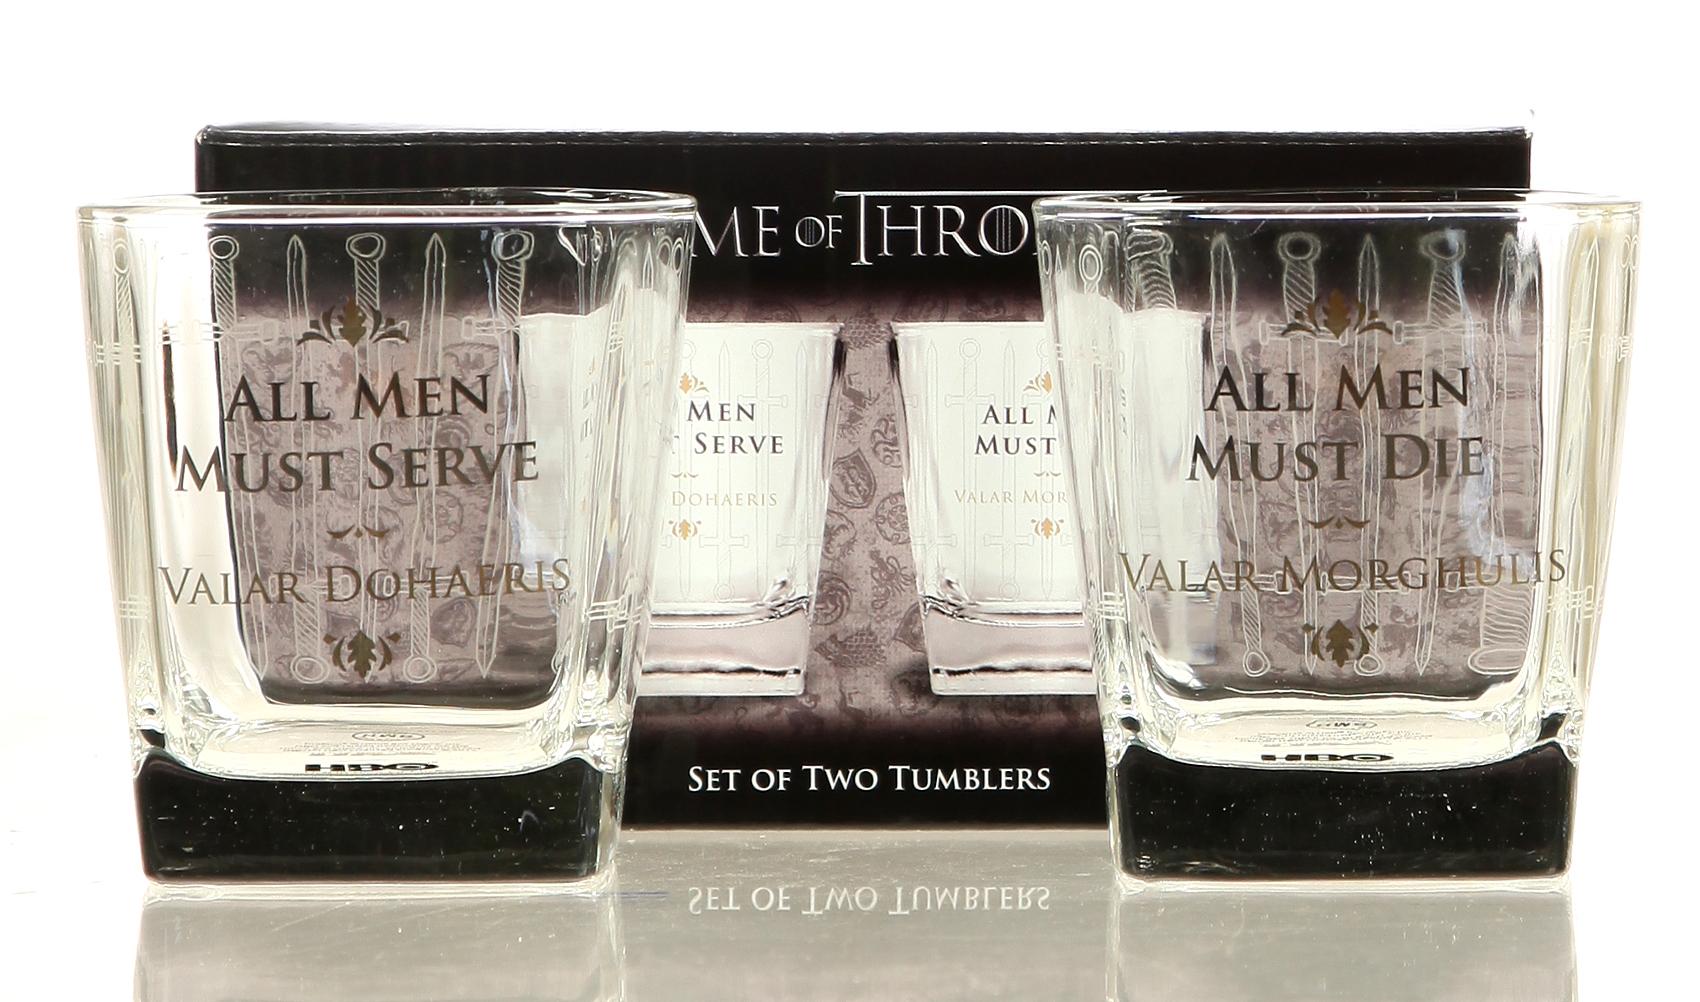 Tumbler Game of Thrones - All Men Doppelpack